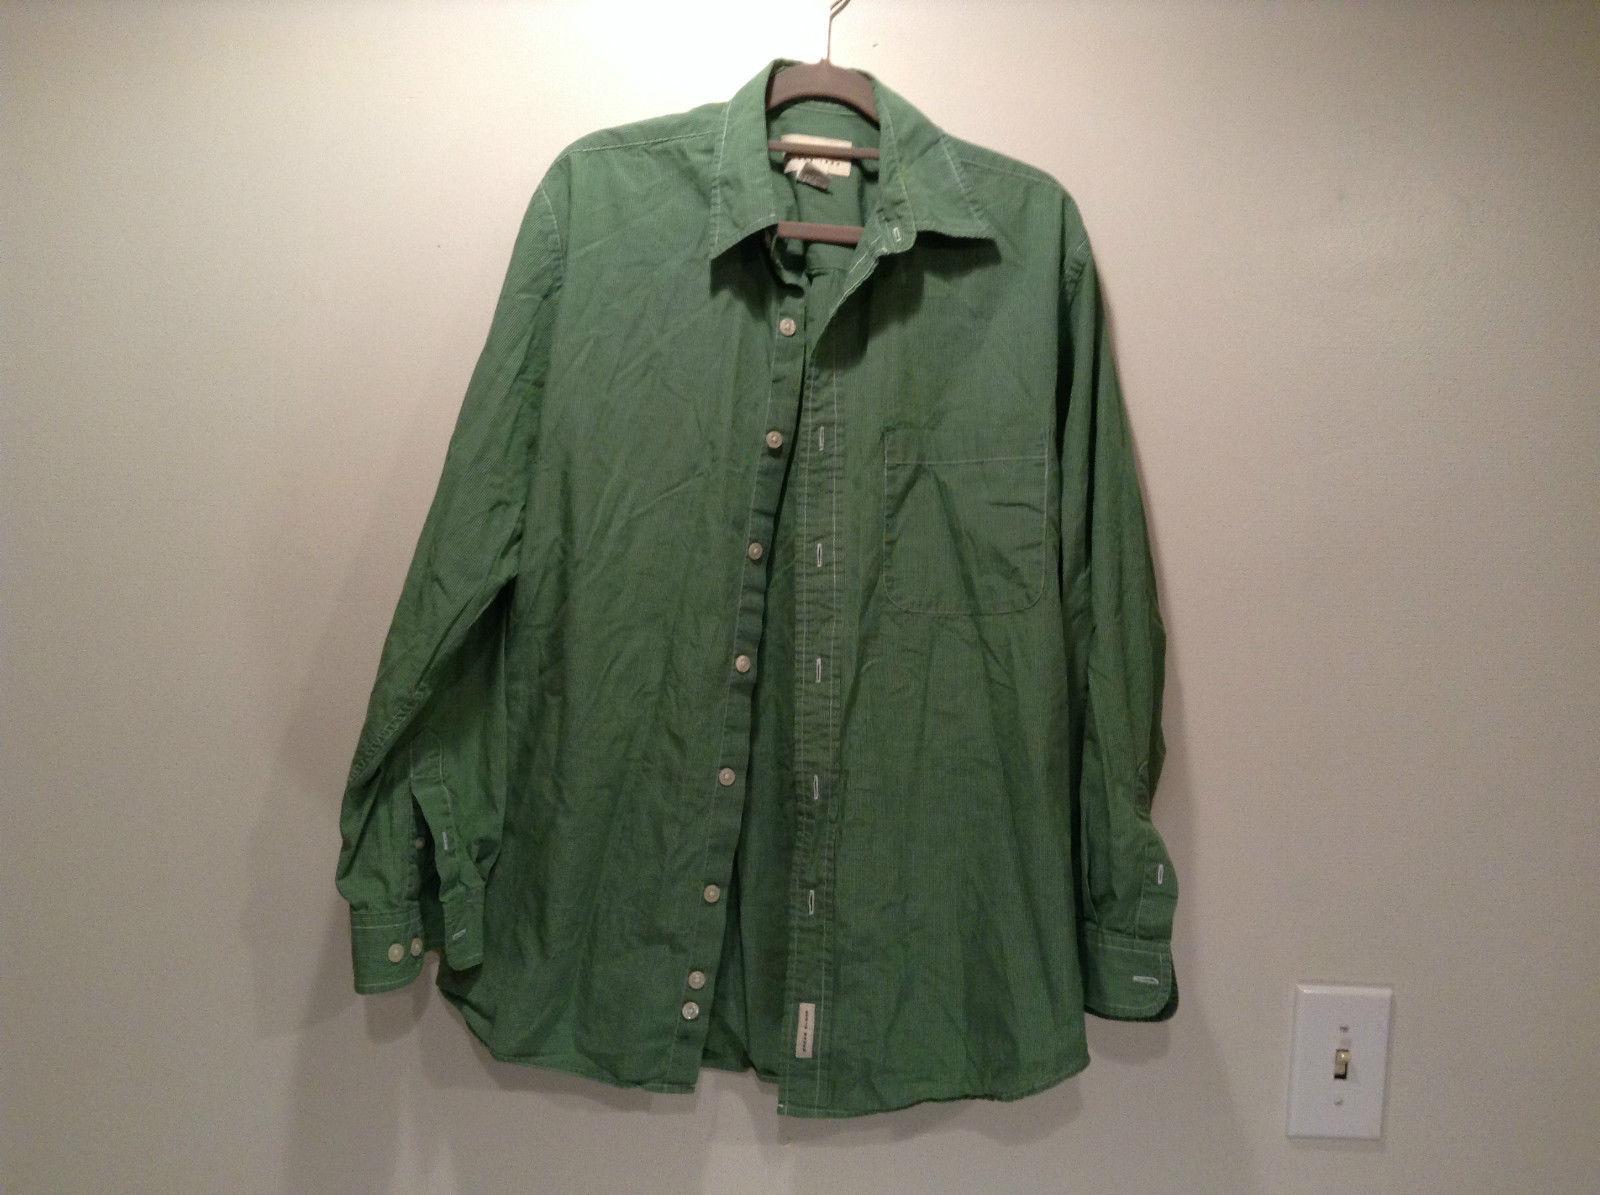 Long Sleeve Green Button Down Eddie Bauer Shirt Size S Reg 100 Percent Cotton